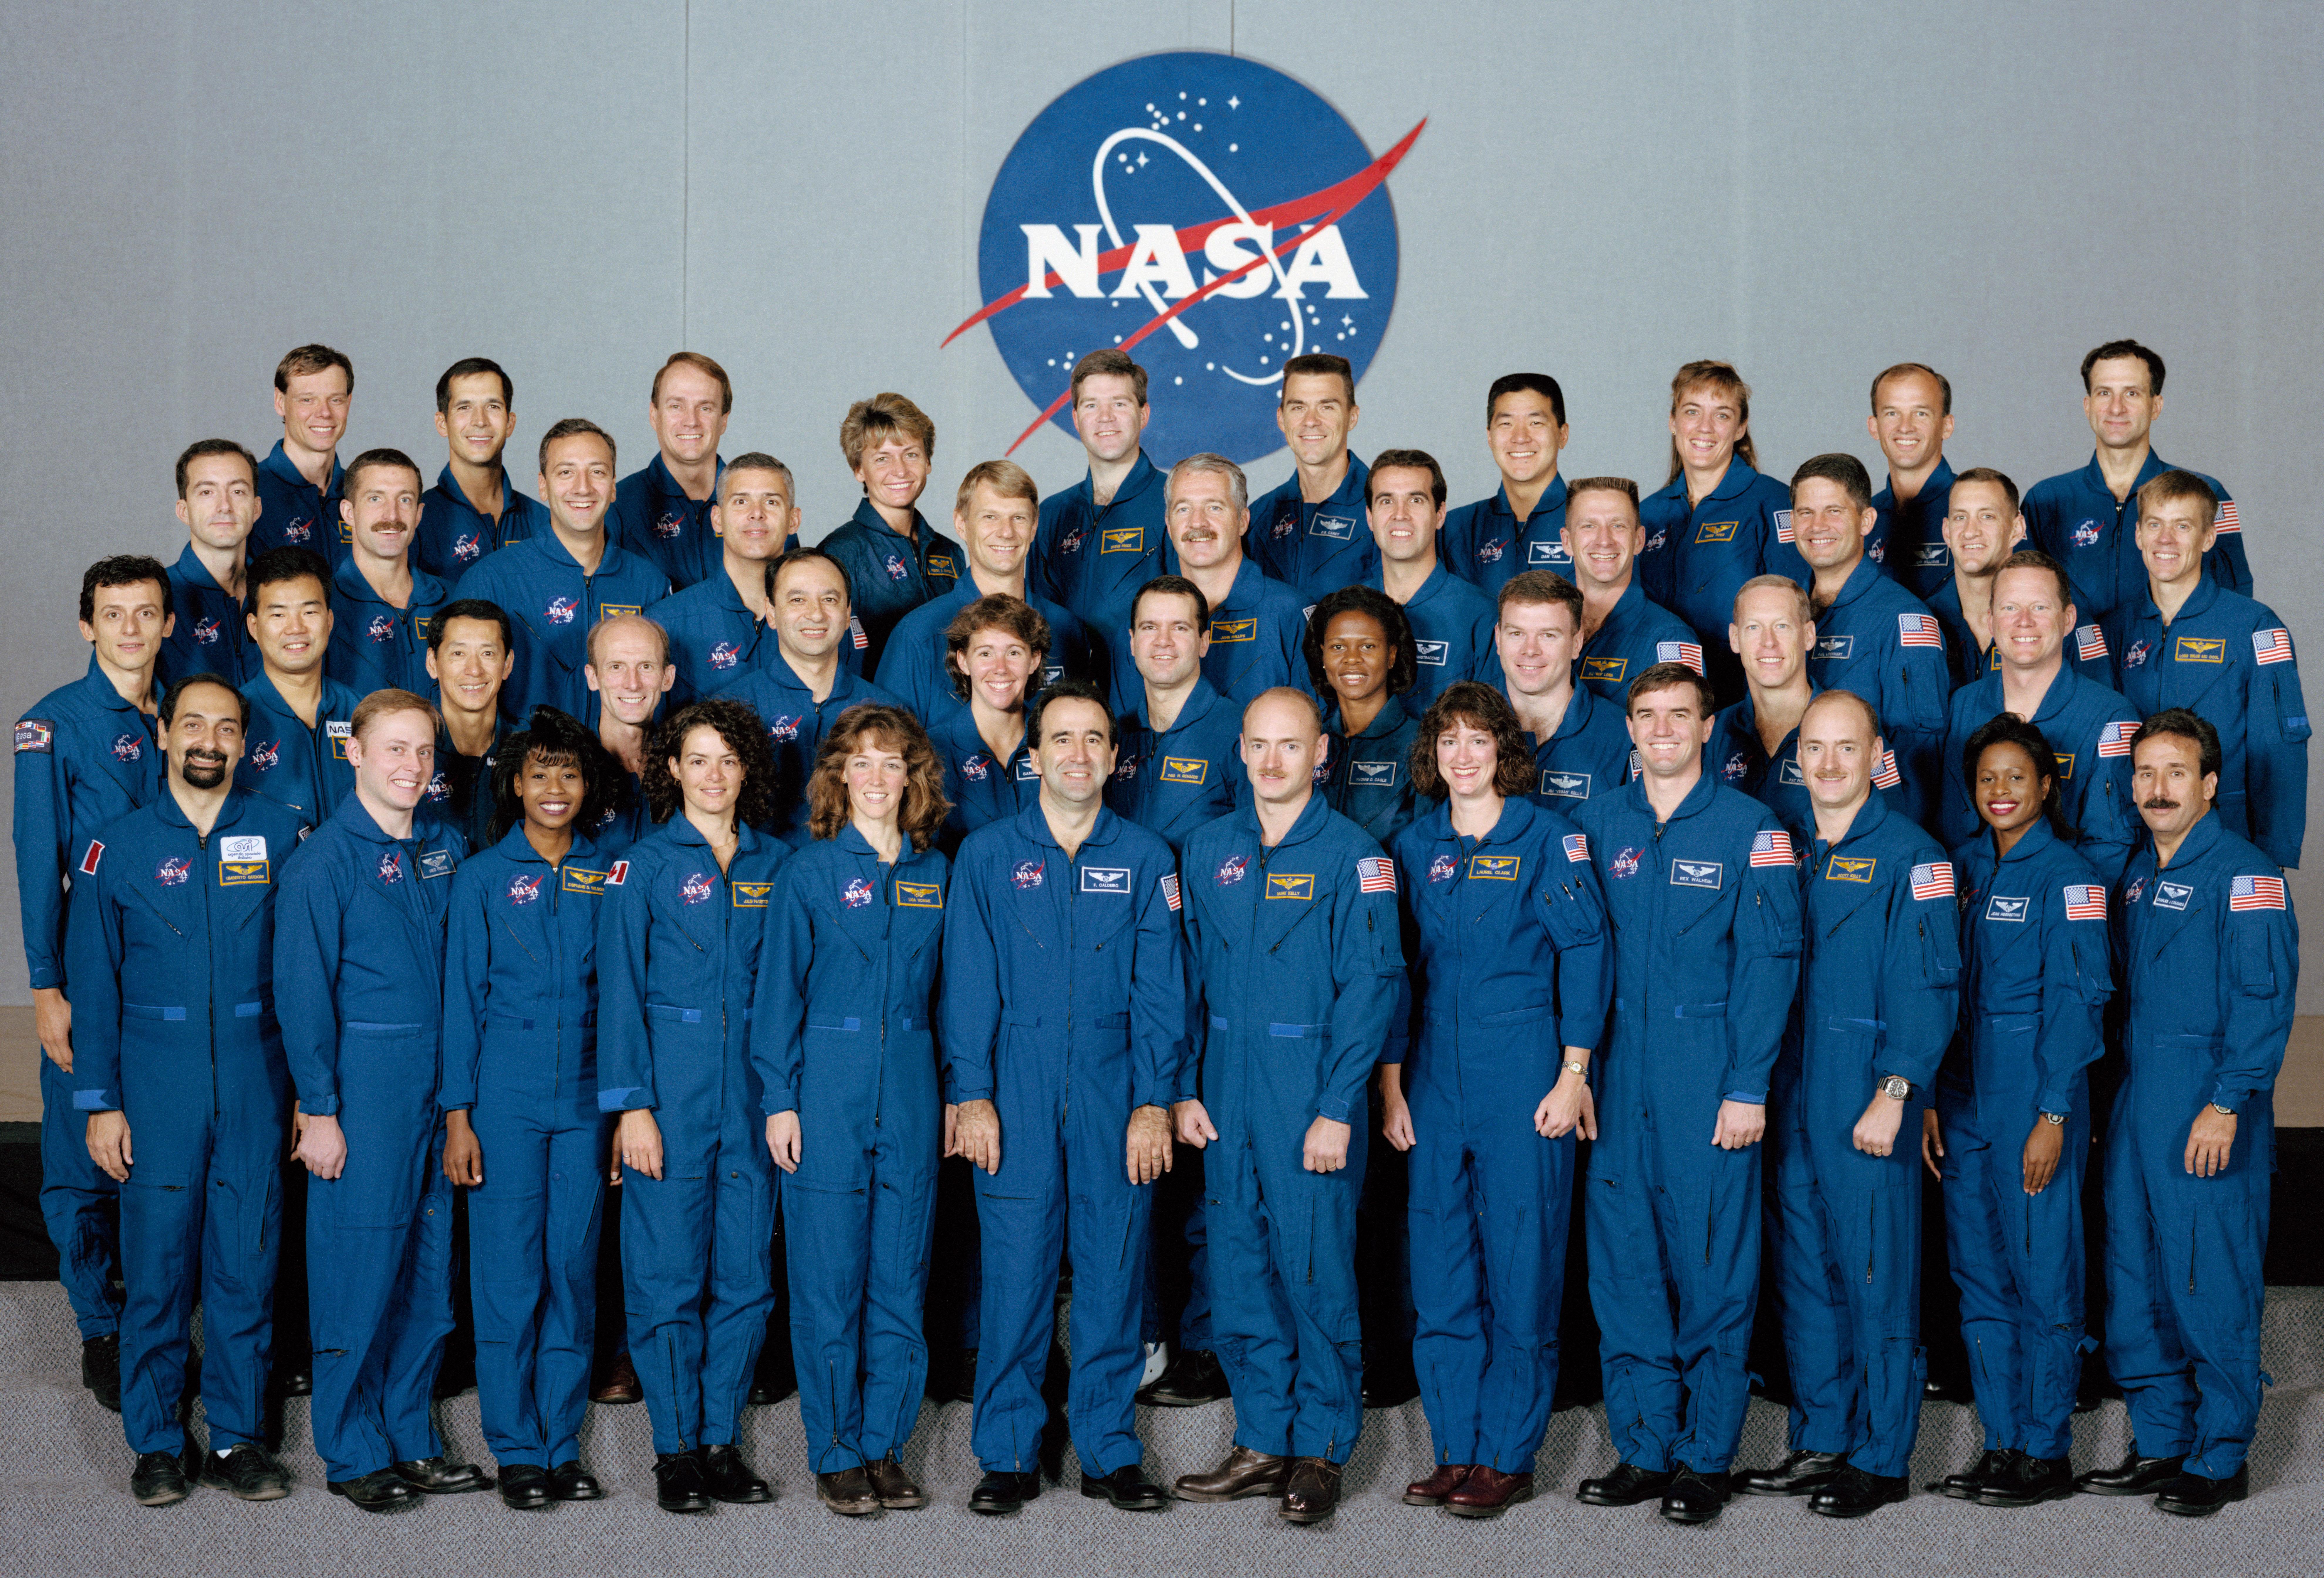 Nasa astronaut class of 1996